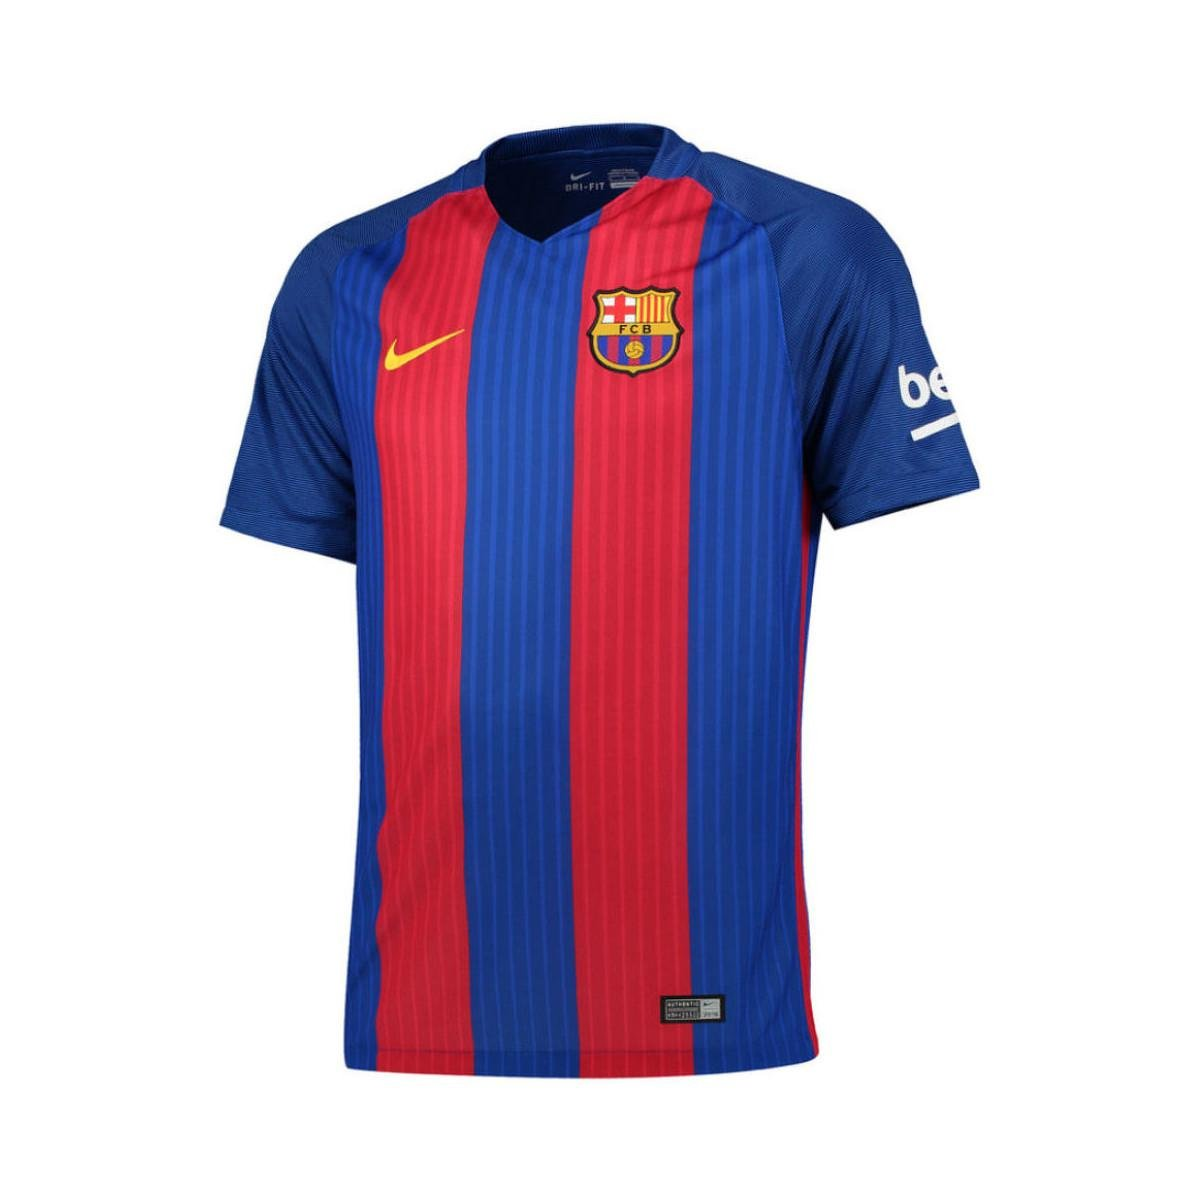 8142d0269 Nike 2016-2017 Barcelona Home Shirt (kids) Men's T Shirt In Red in ...